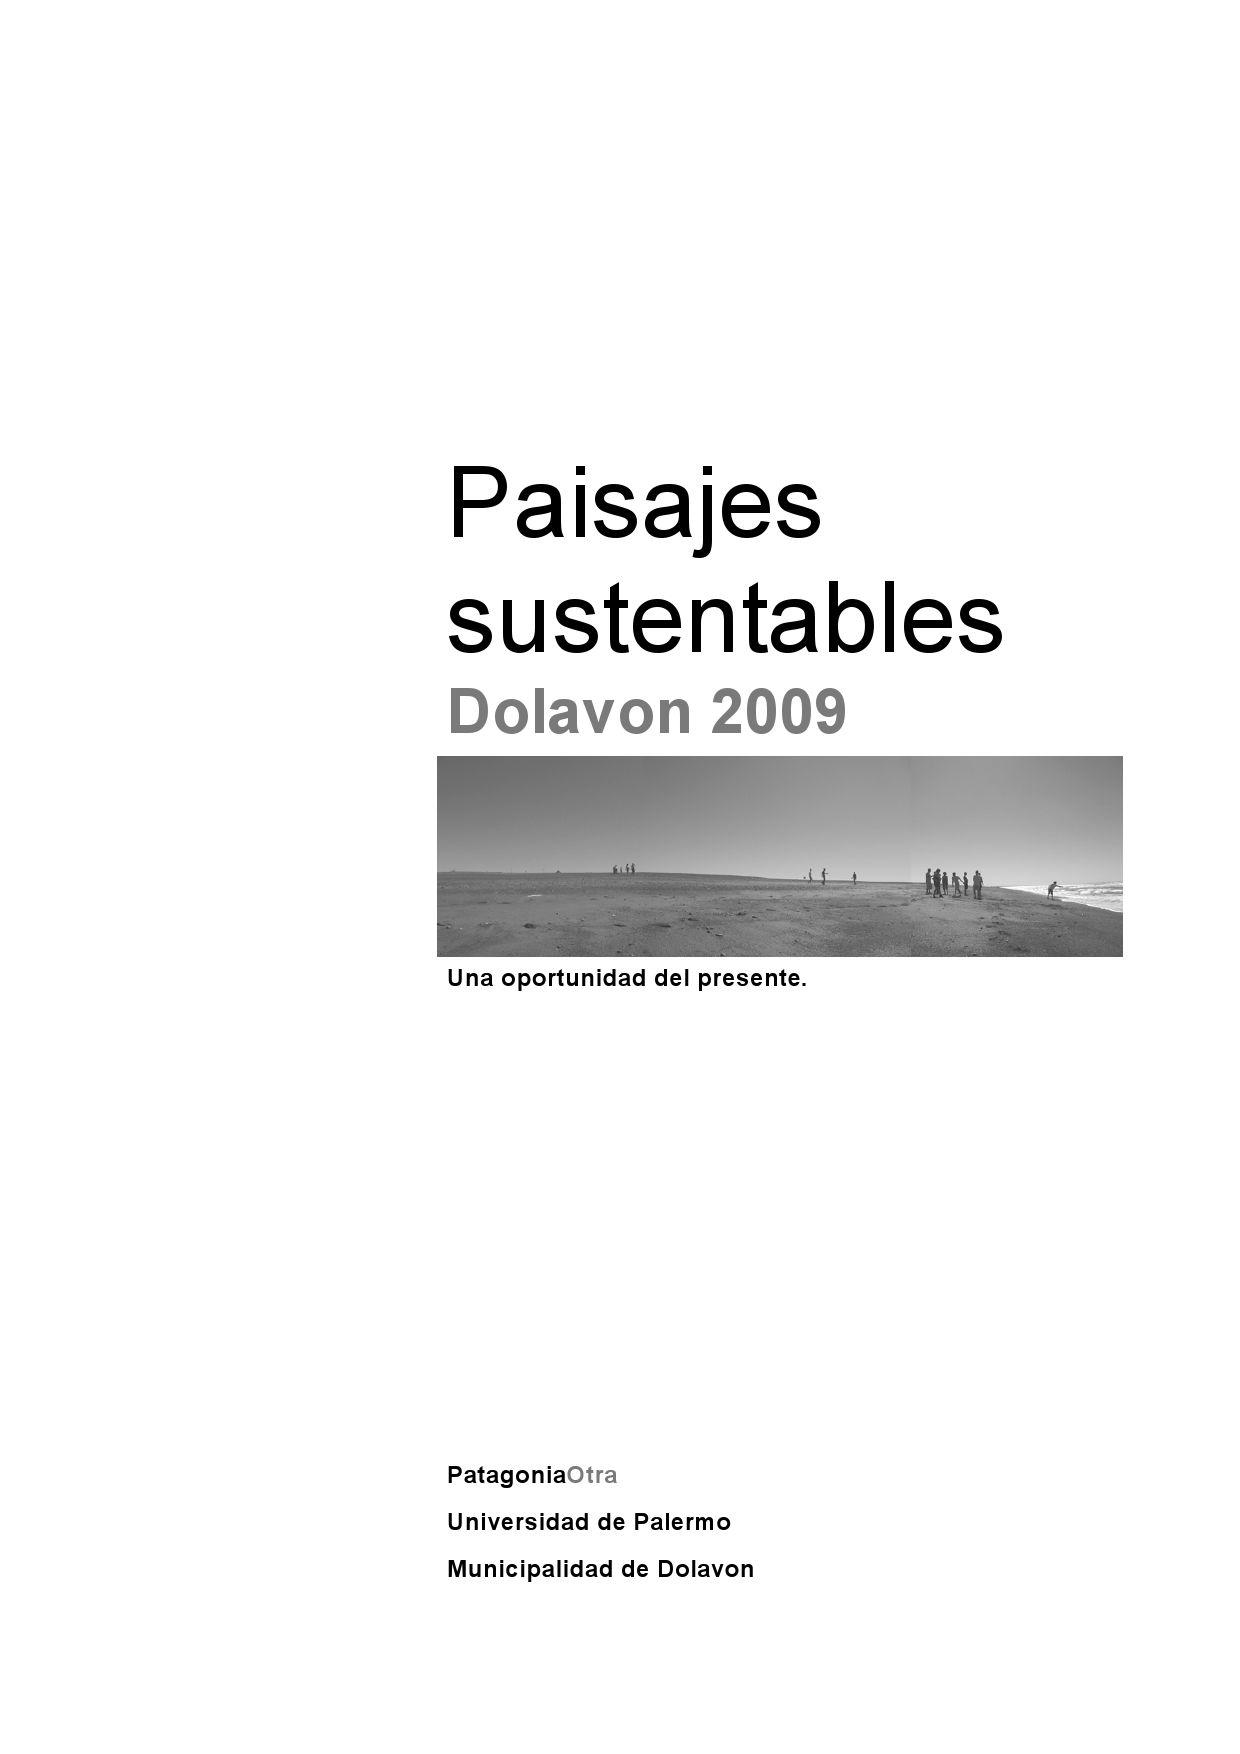 Paisajes Sustentables. Dolavon 2009 by patagoniaOtra . - issuu